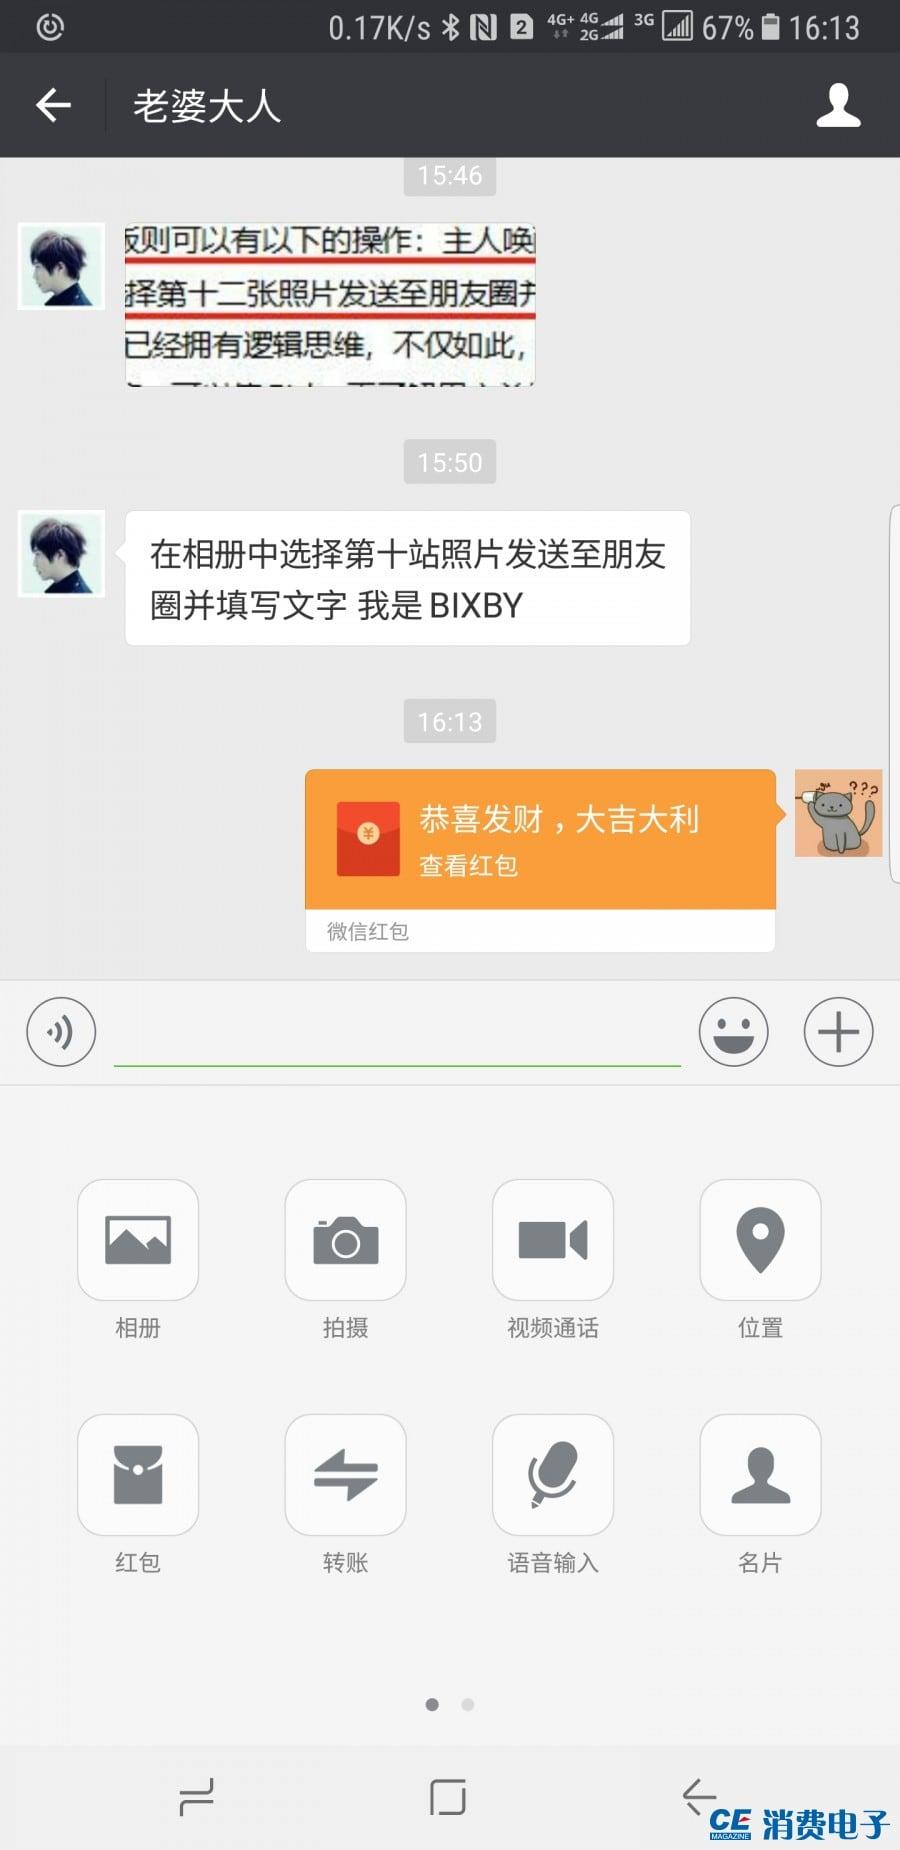 BIBXY发朋友圈完成成功截图.jpg